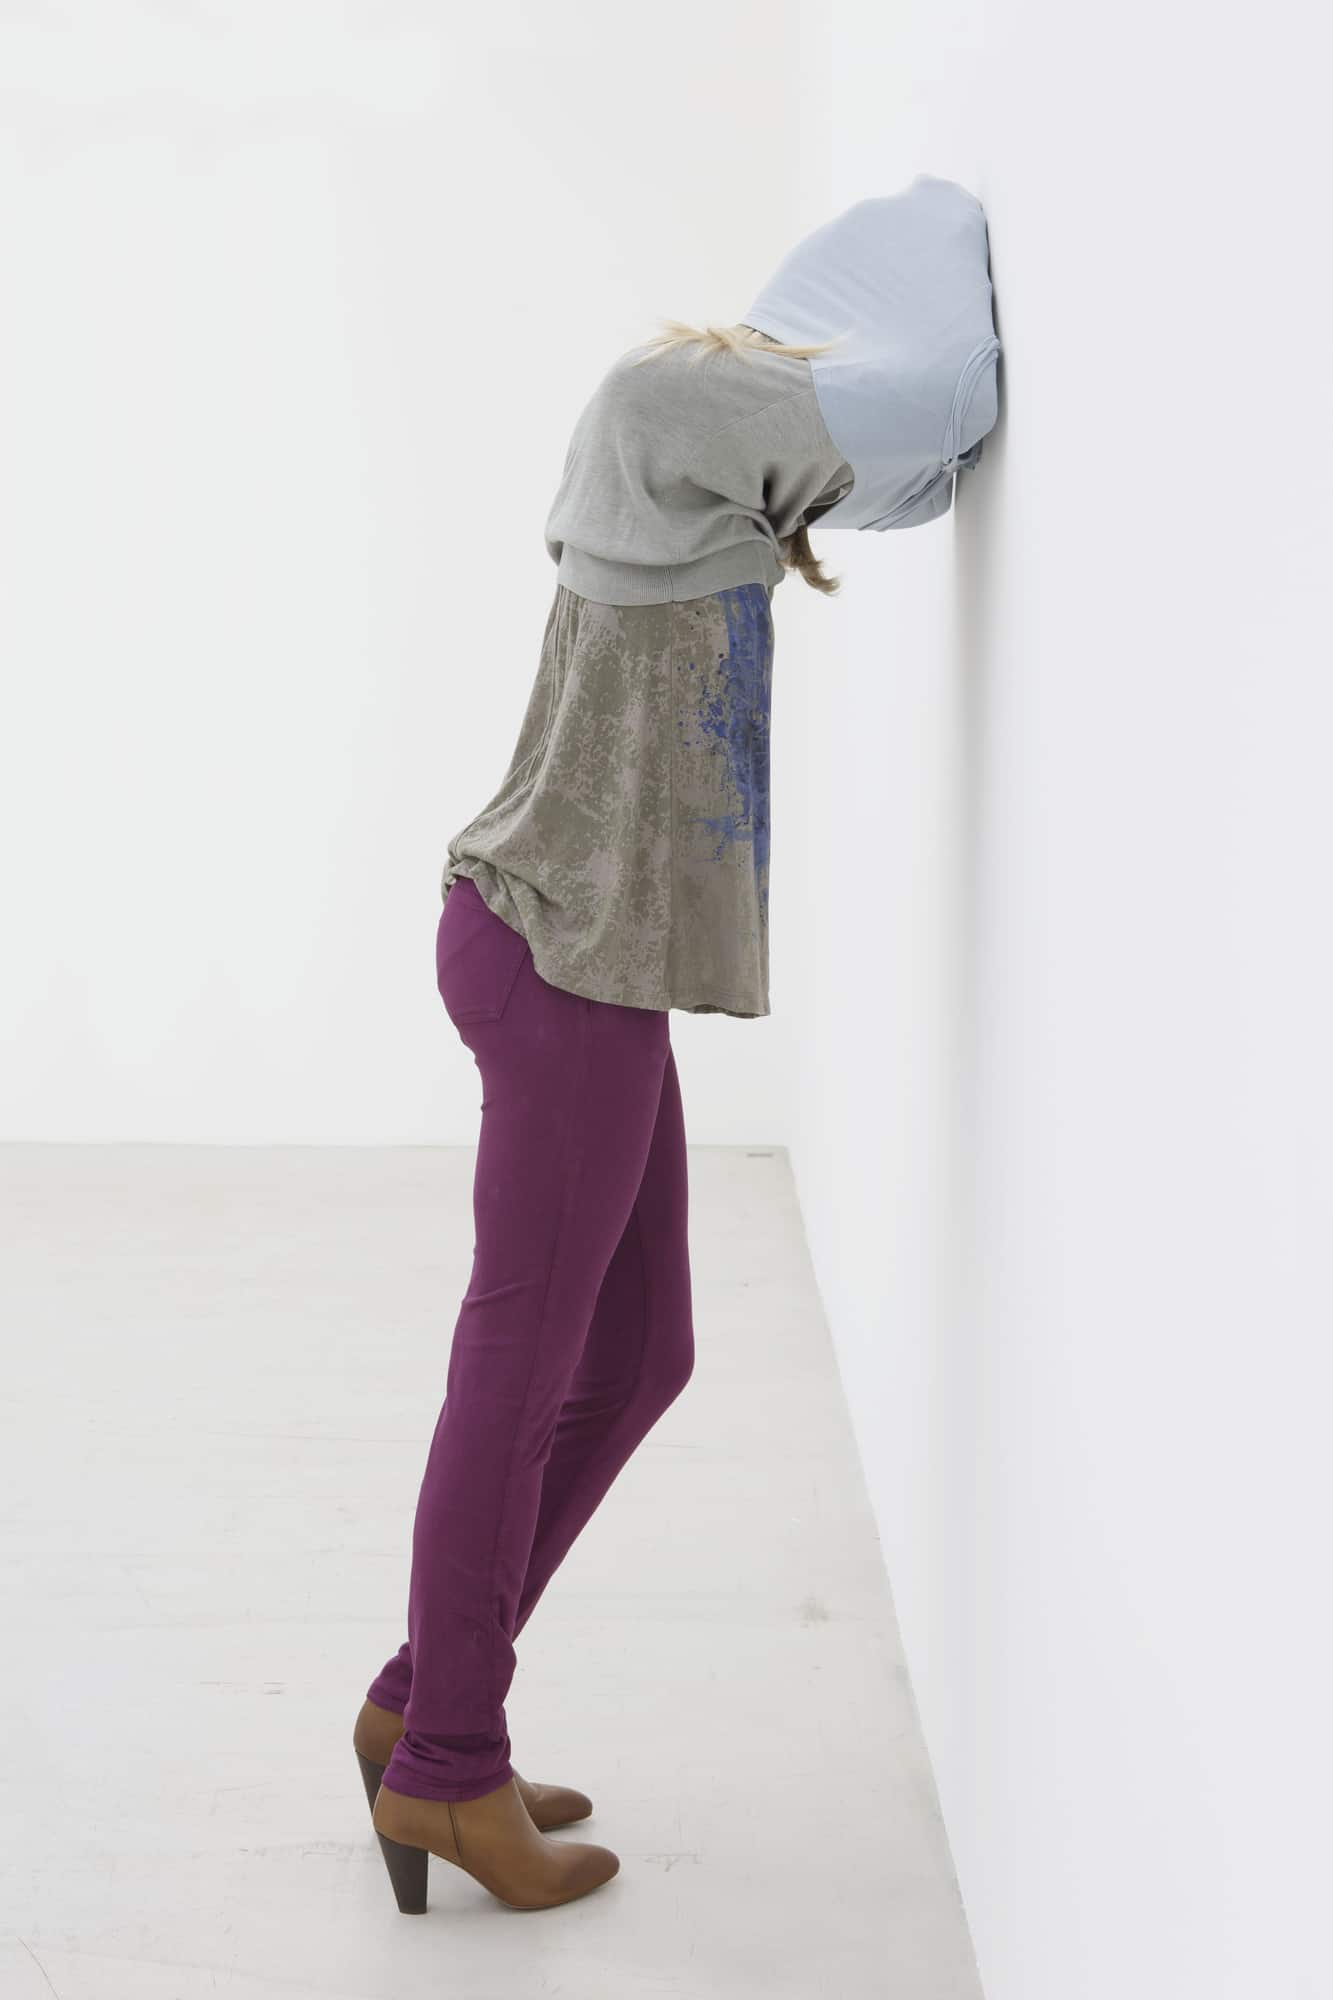 Daniel Firman, Hortense, 2013 © COPYRIGHT   DANIEL FIRMAN   ALL RIGHTS RESERVED